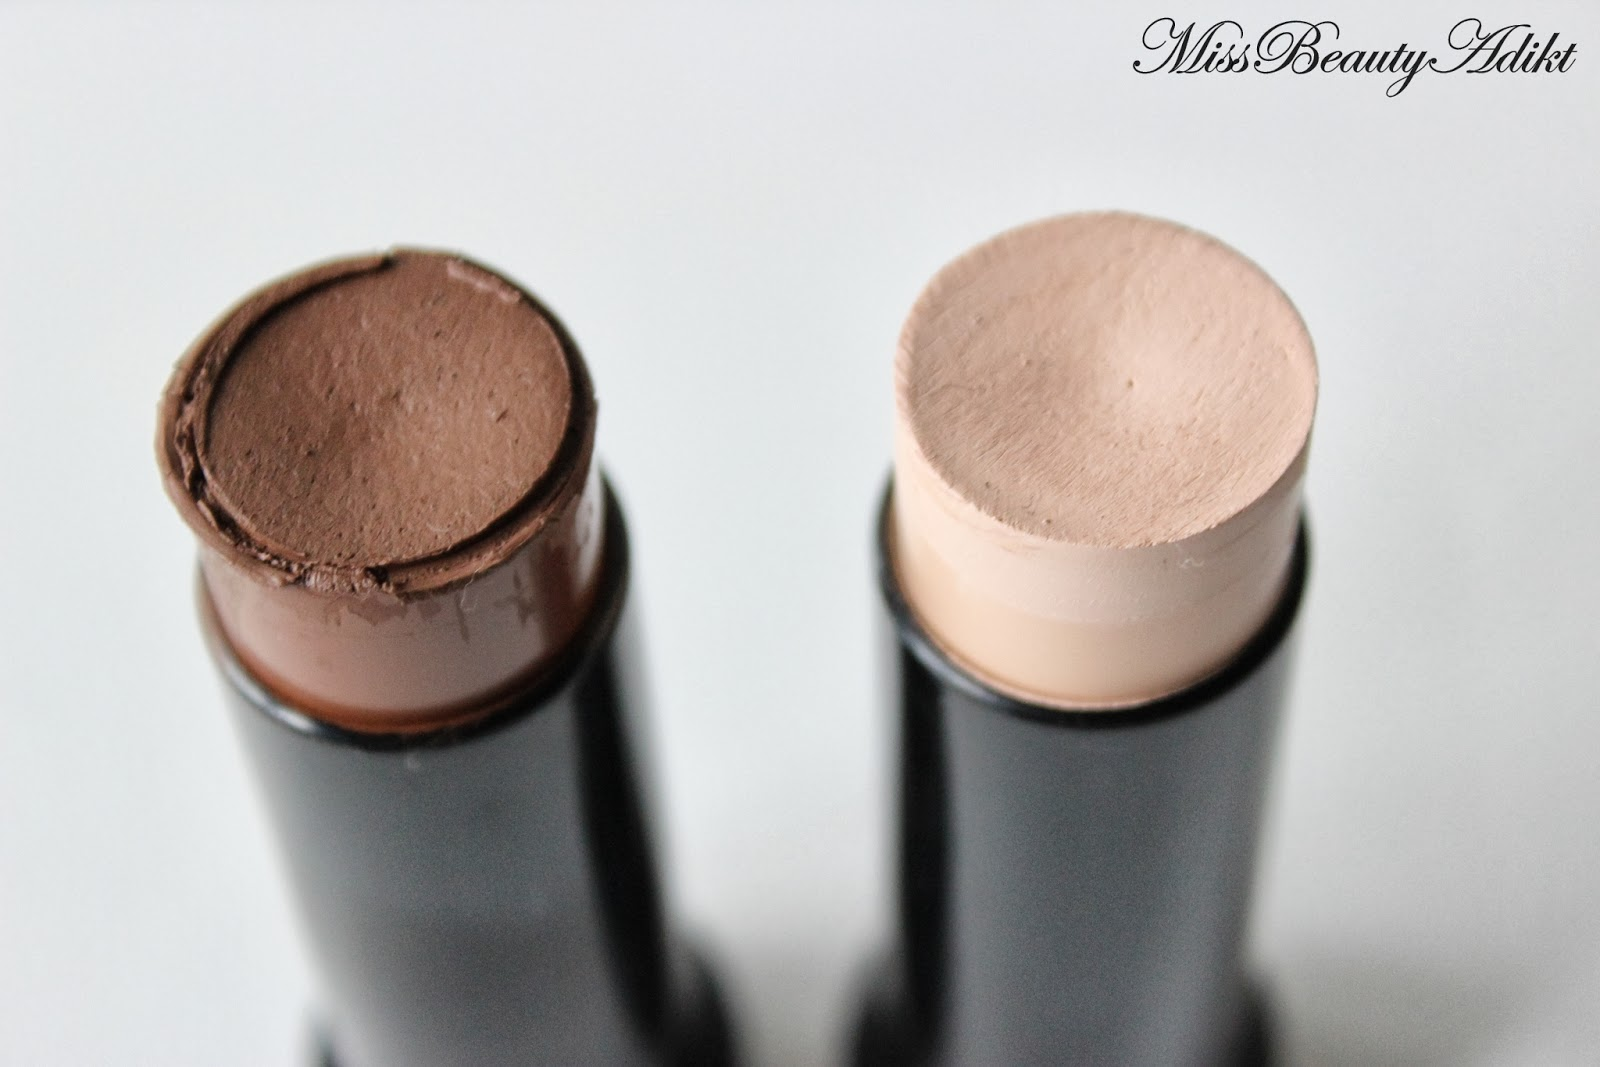 ... Zukreat Artist of Makeup Contour Sticks Review + Swatches